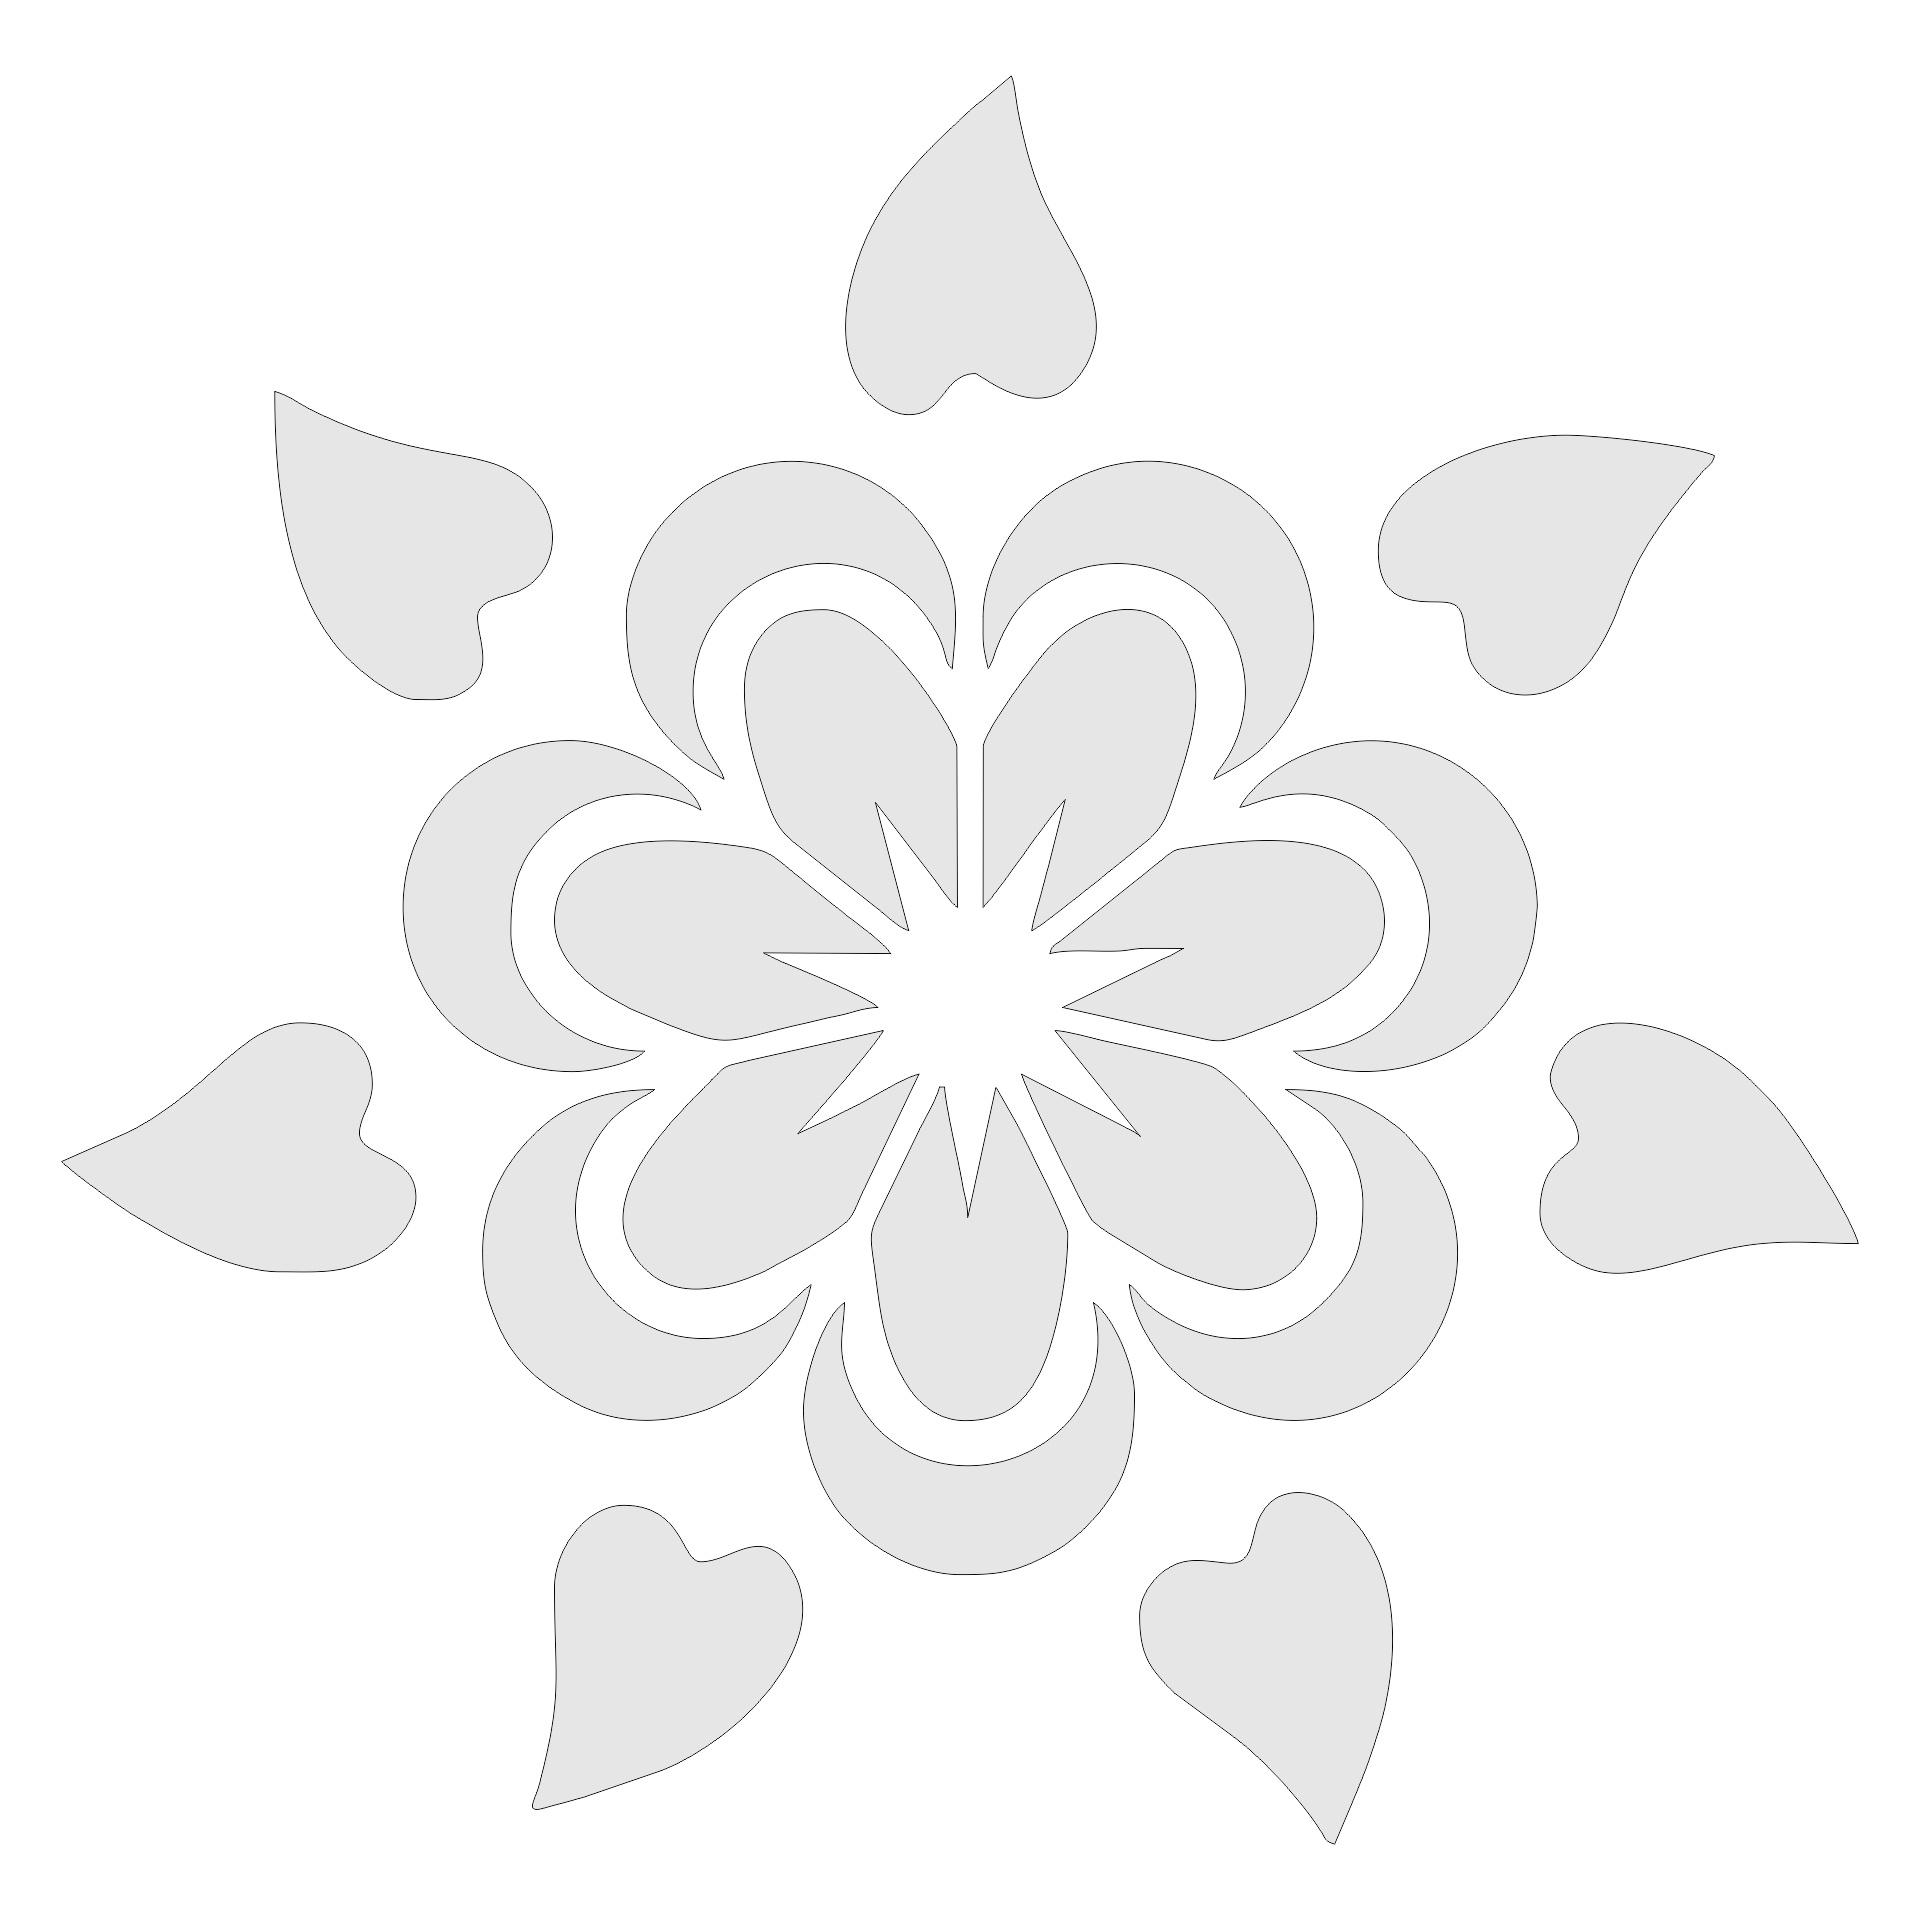 Large Flower Stencils : Best images of large flower stencils printable